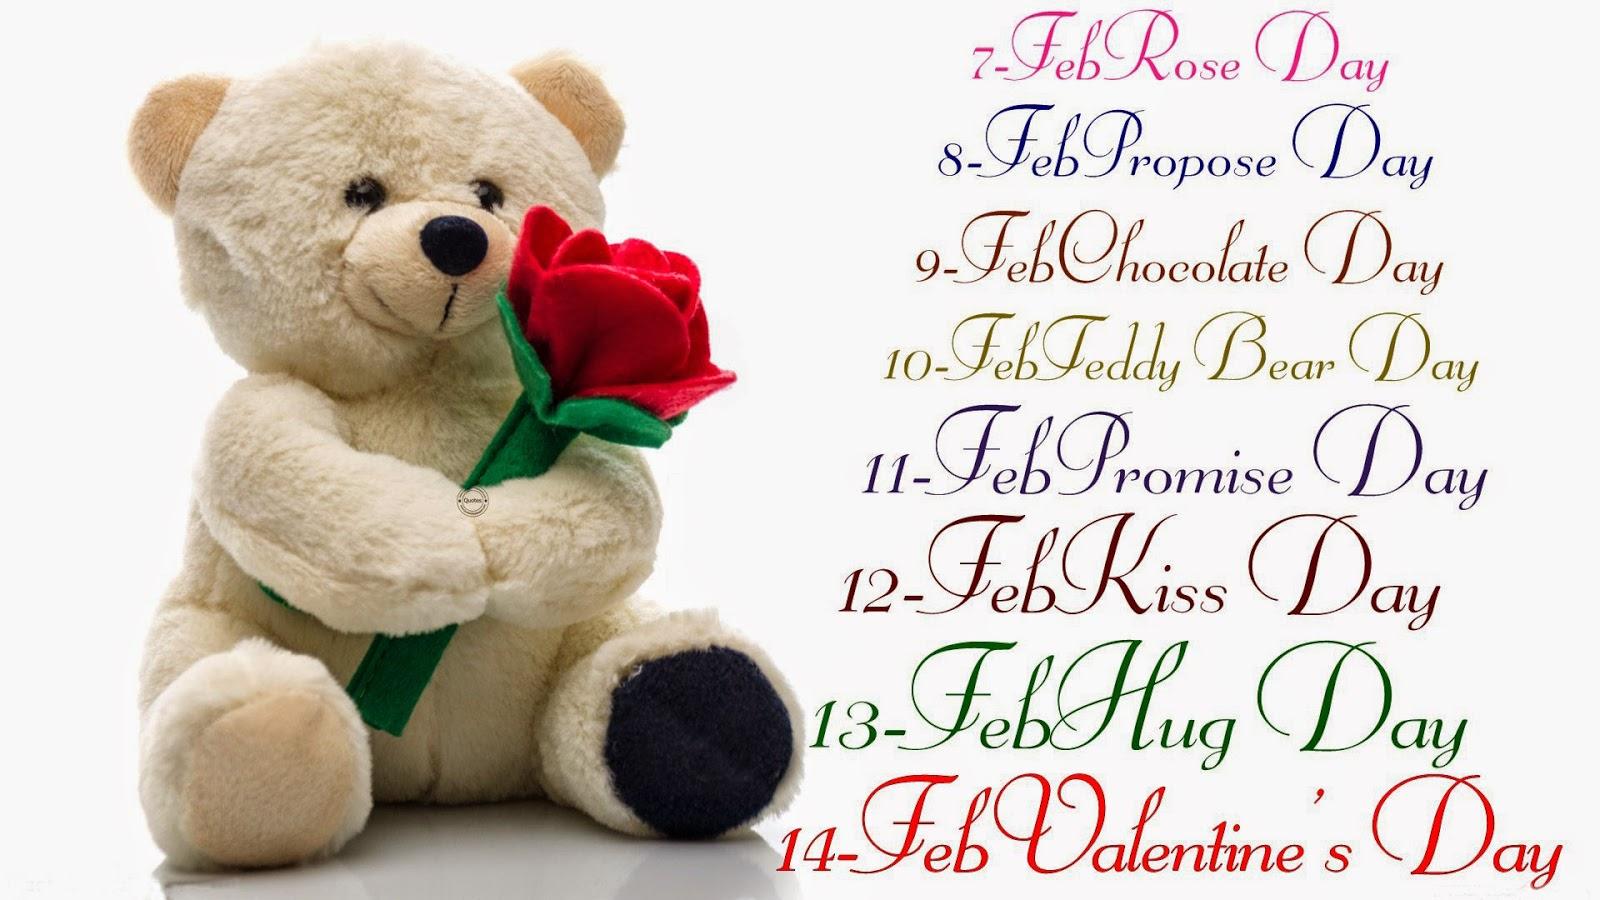 February Valentine Date Sheet Valentine's Date Sheet 2015